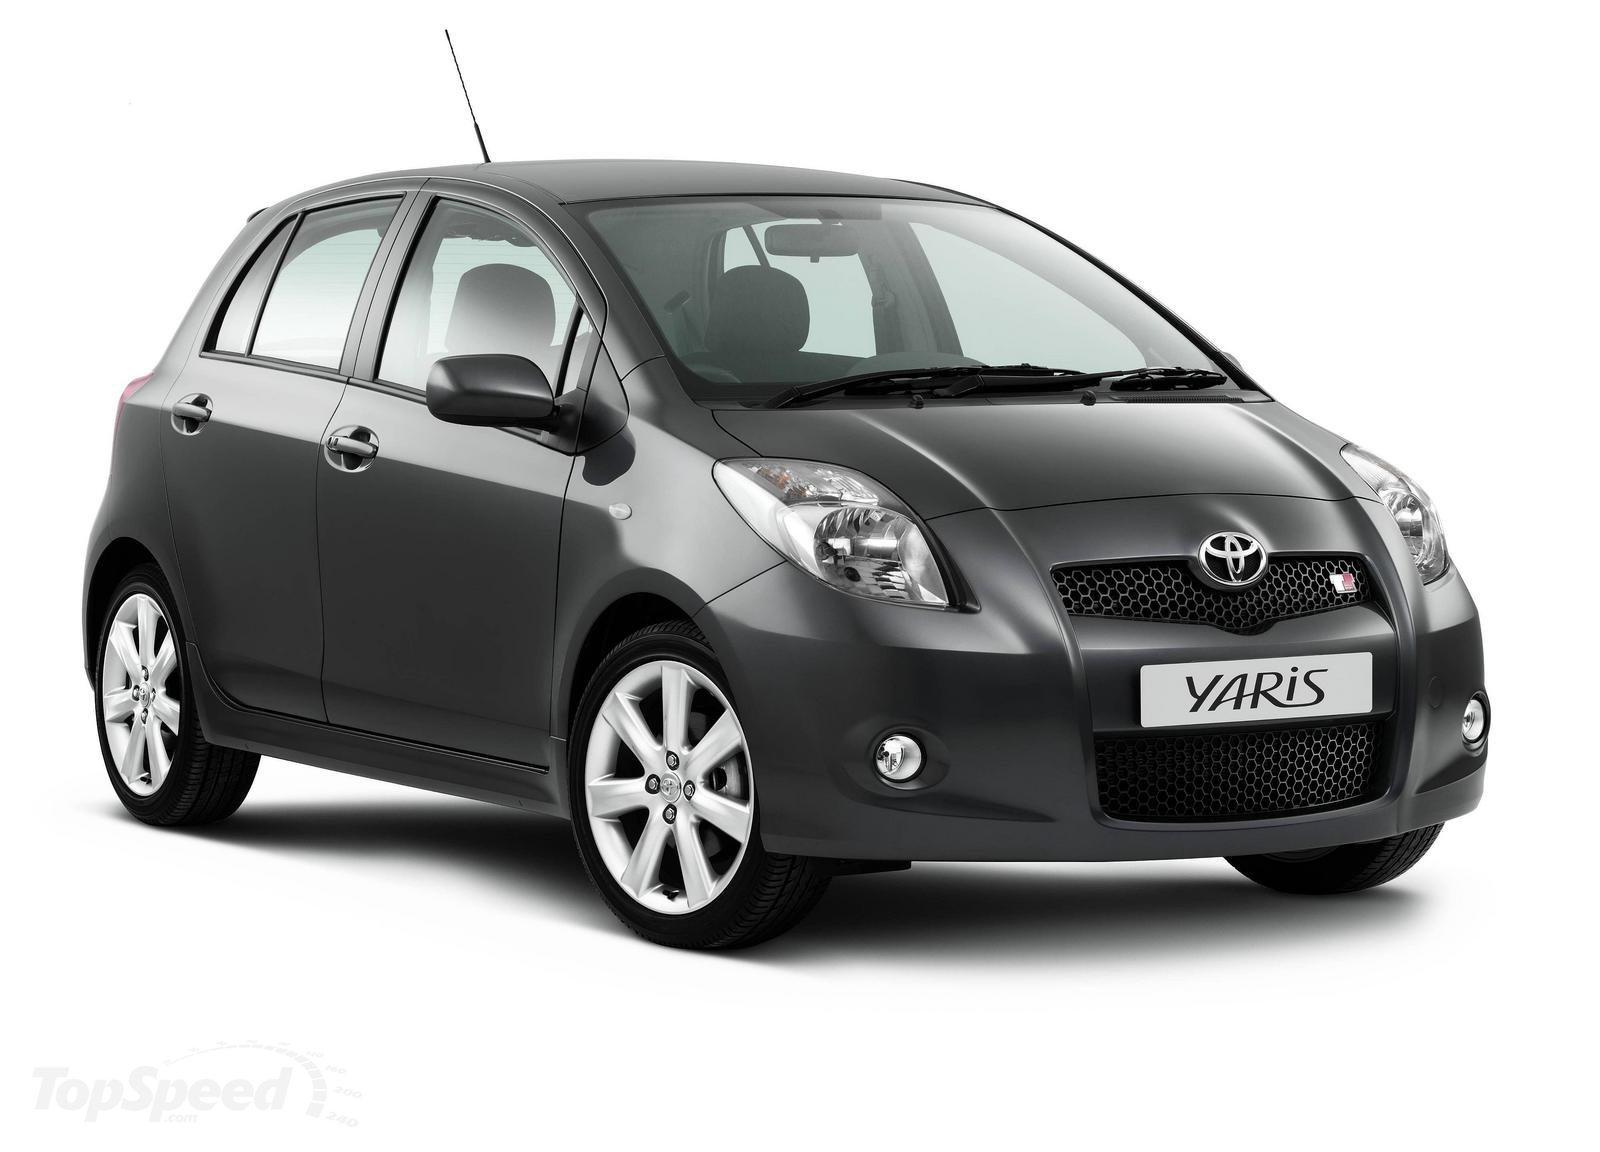 Toyota Yaris Trd Sportivo Harga All New Kijang Innova Vs Crv Daftar Mobil Bekas Terbaru 2016